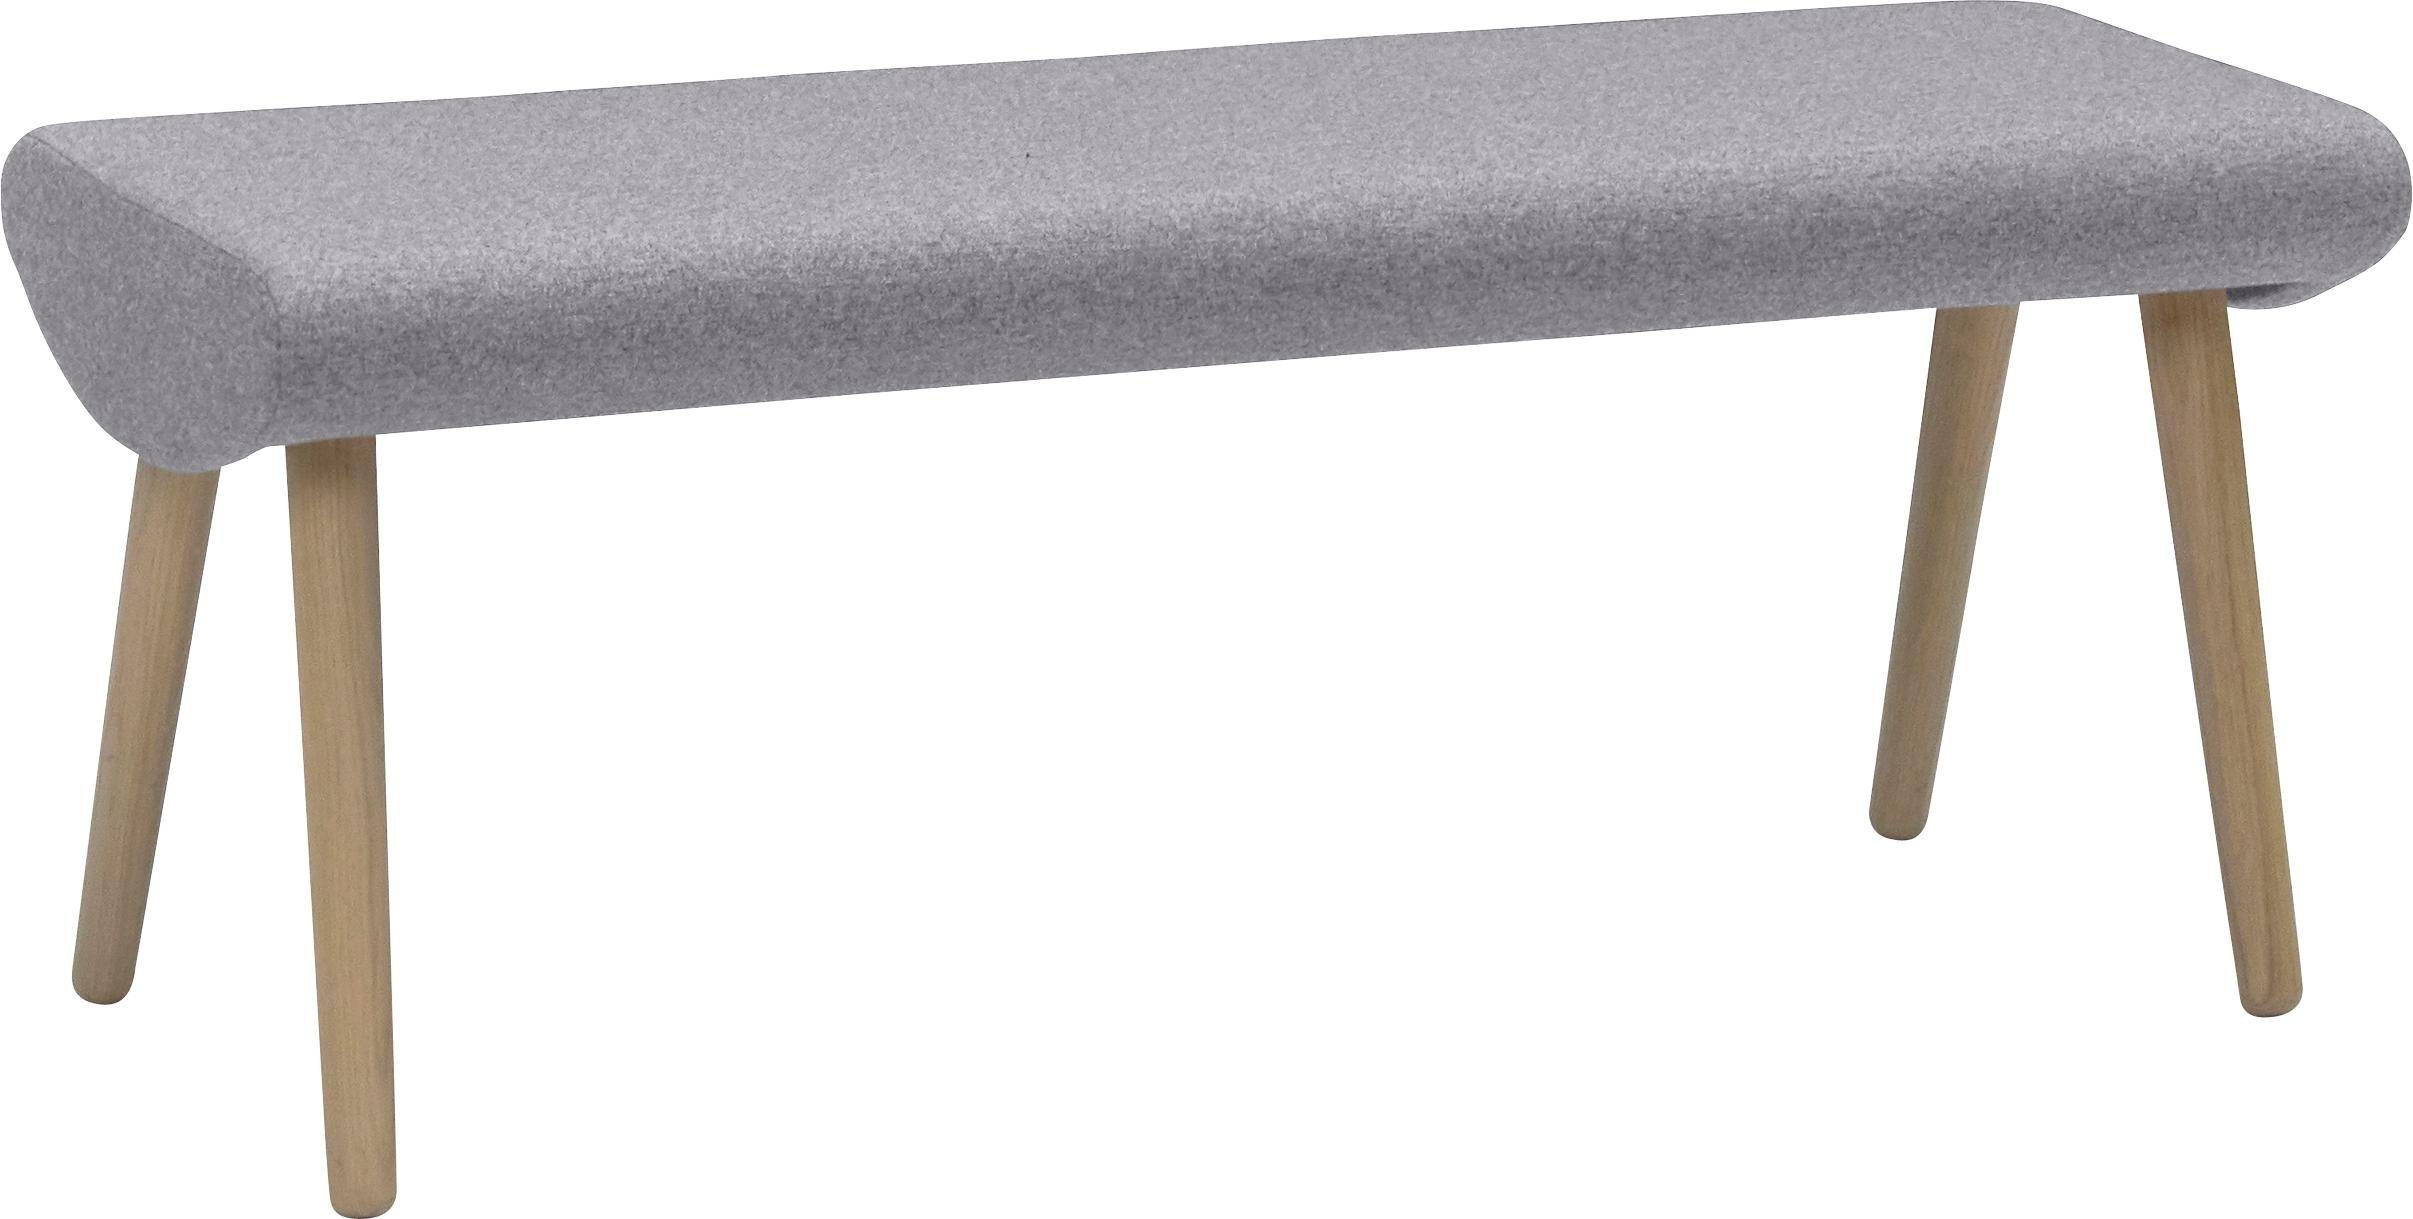 Perfekt Sitzbank »Eclipse«, Breite 160 Cm